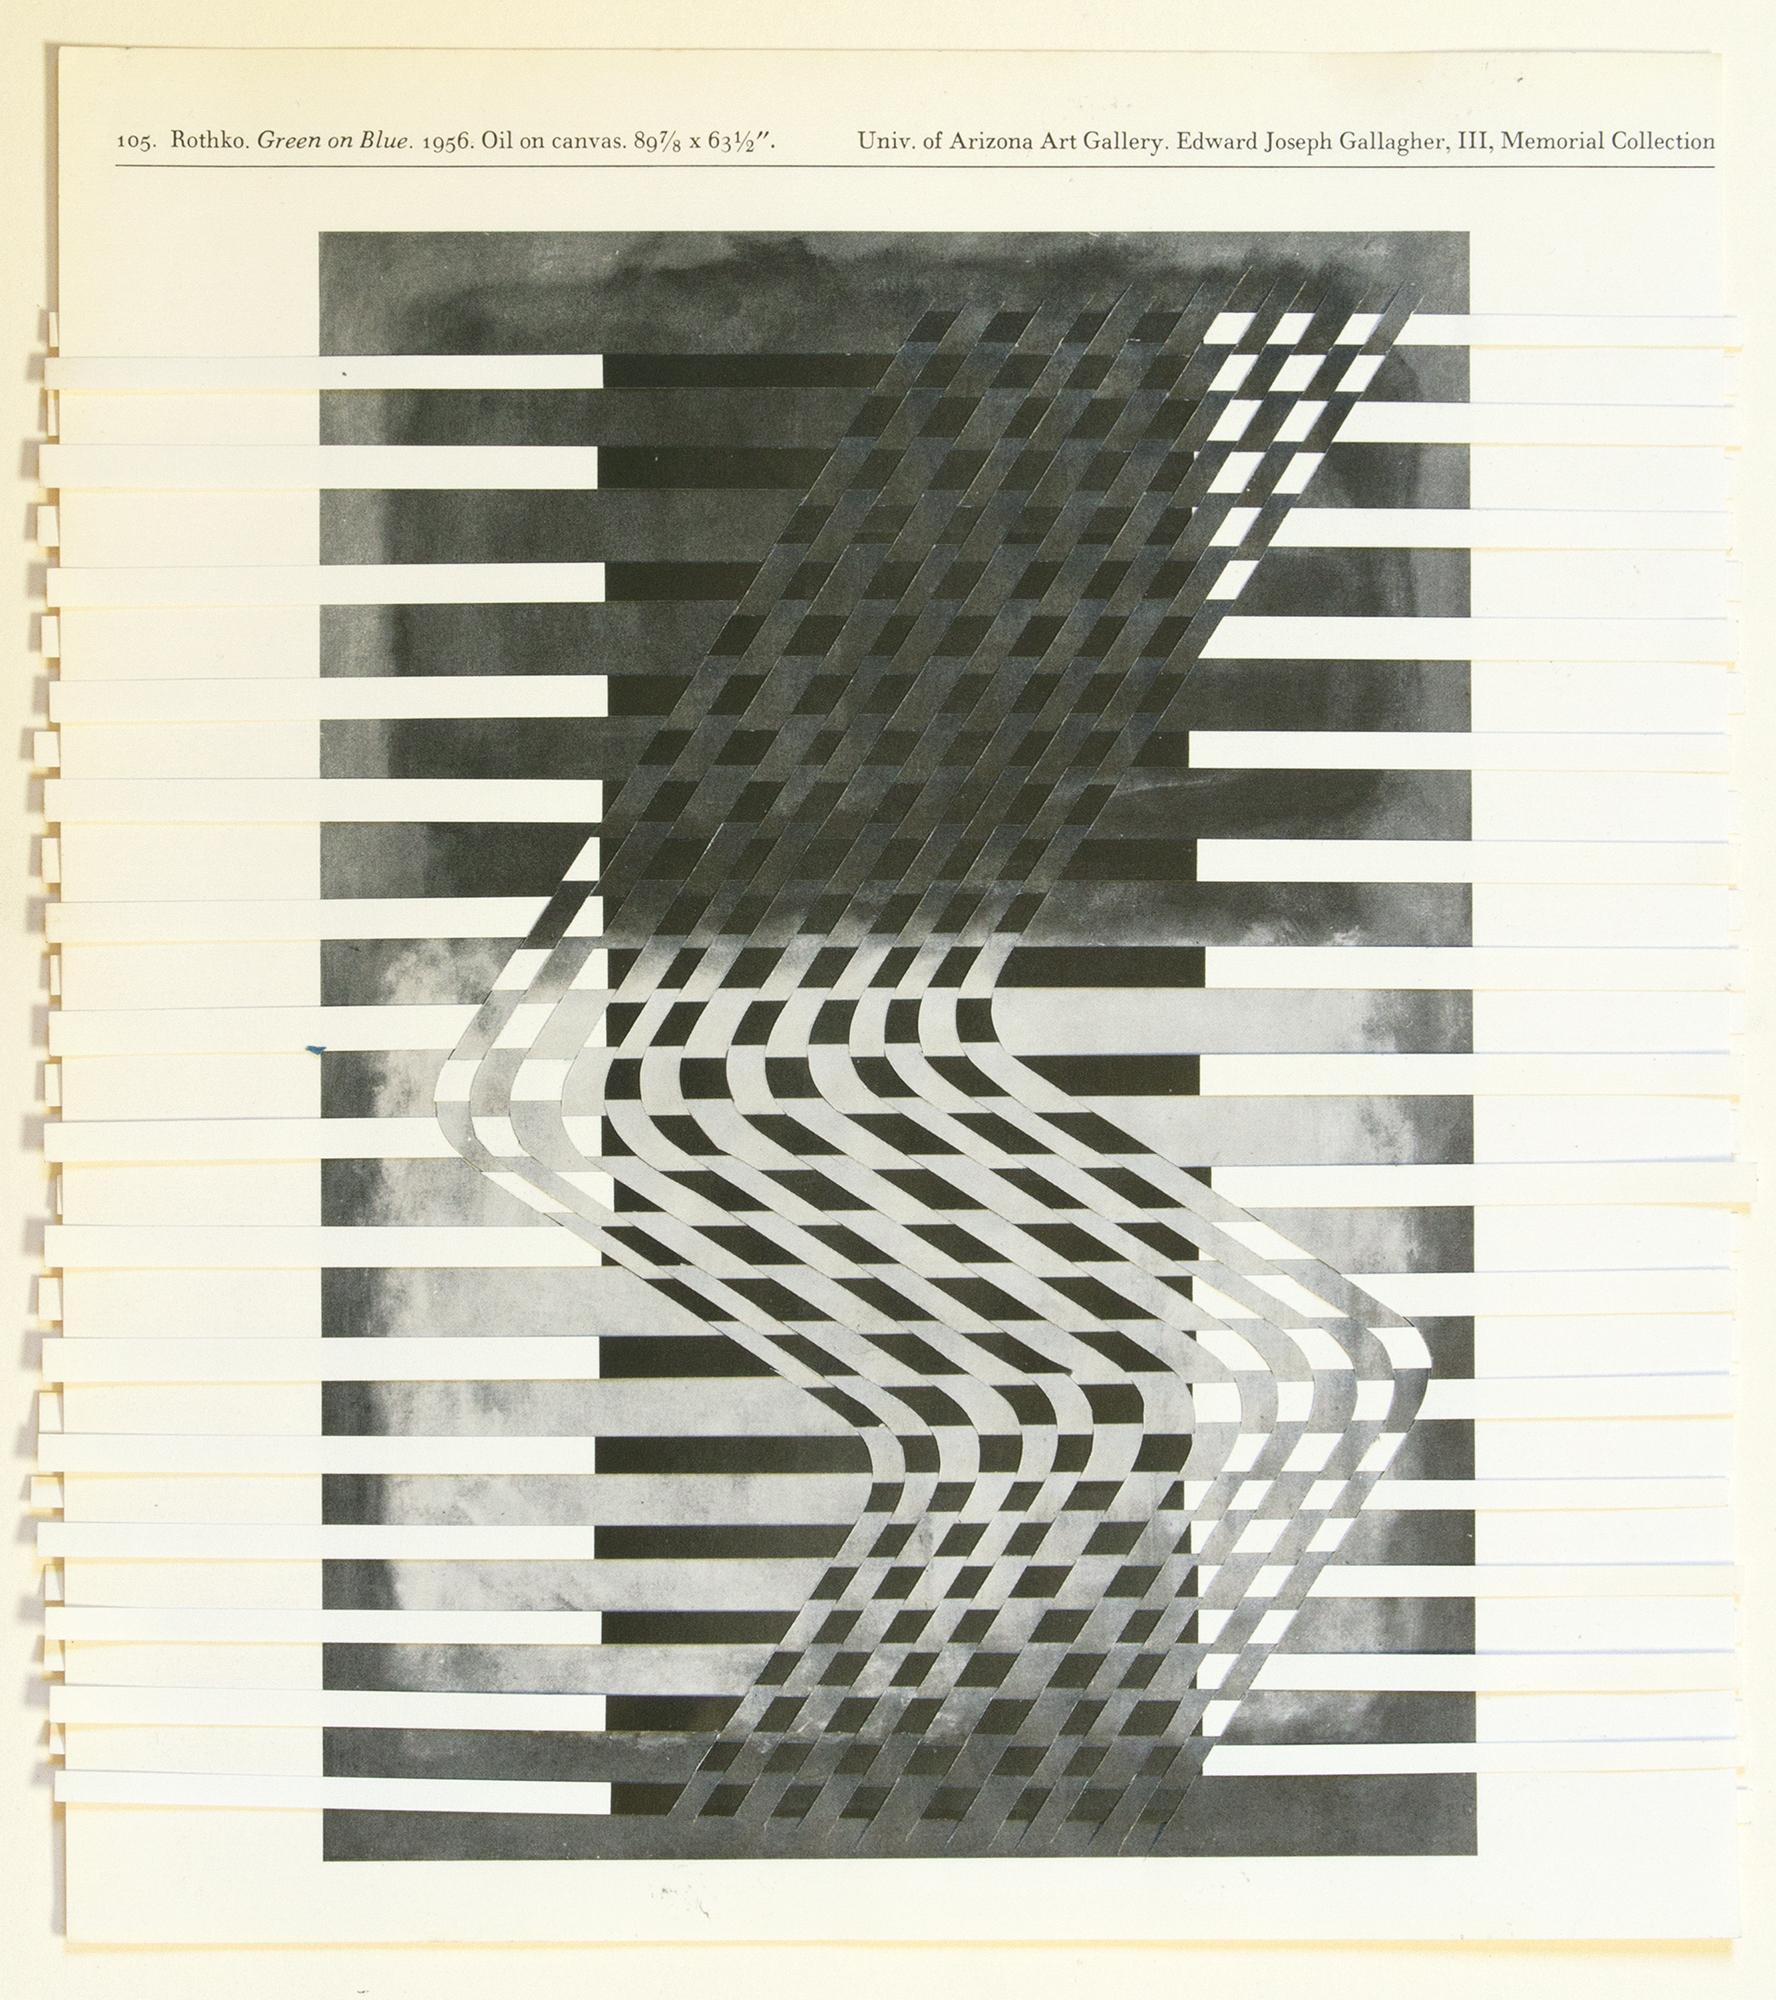 rothkoreinhardt (black and white), 2014, paper weaving, 8 x 9